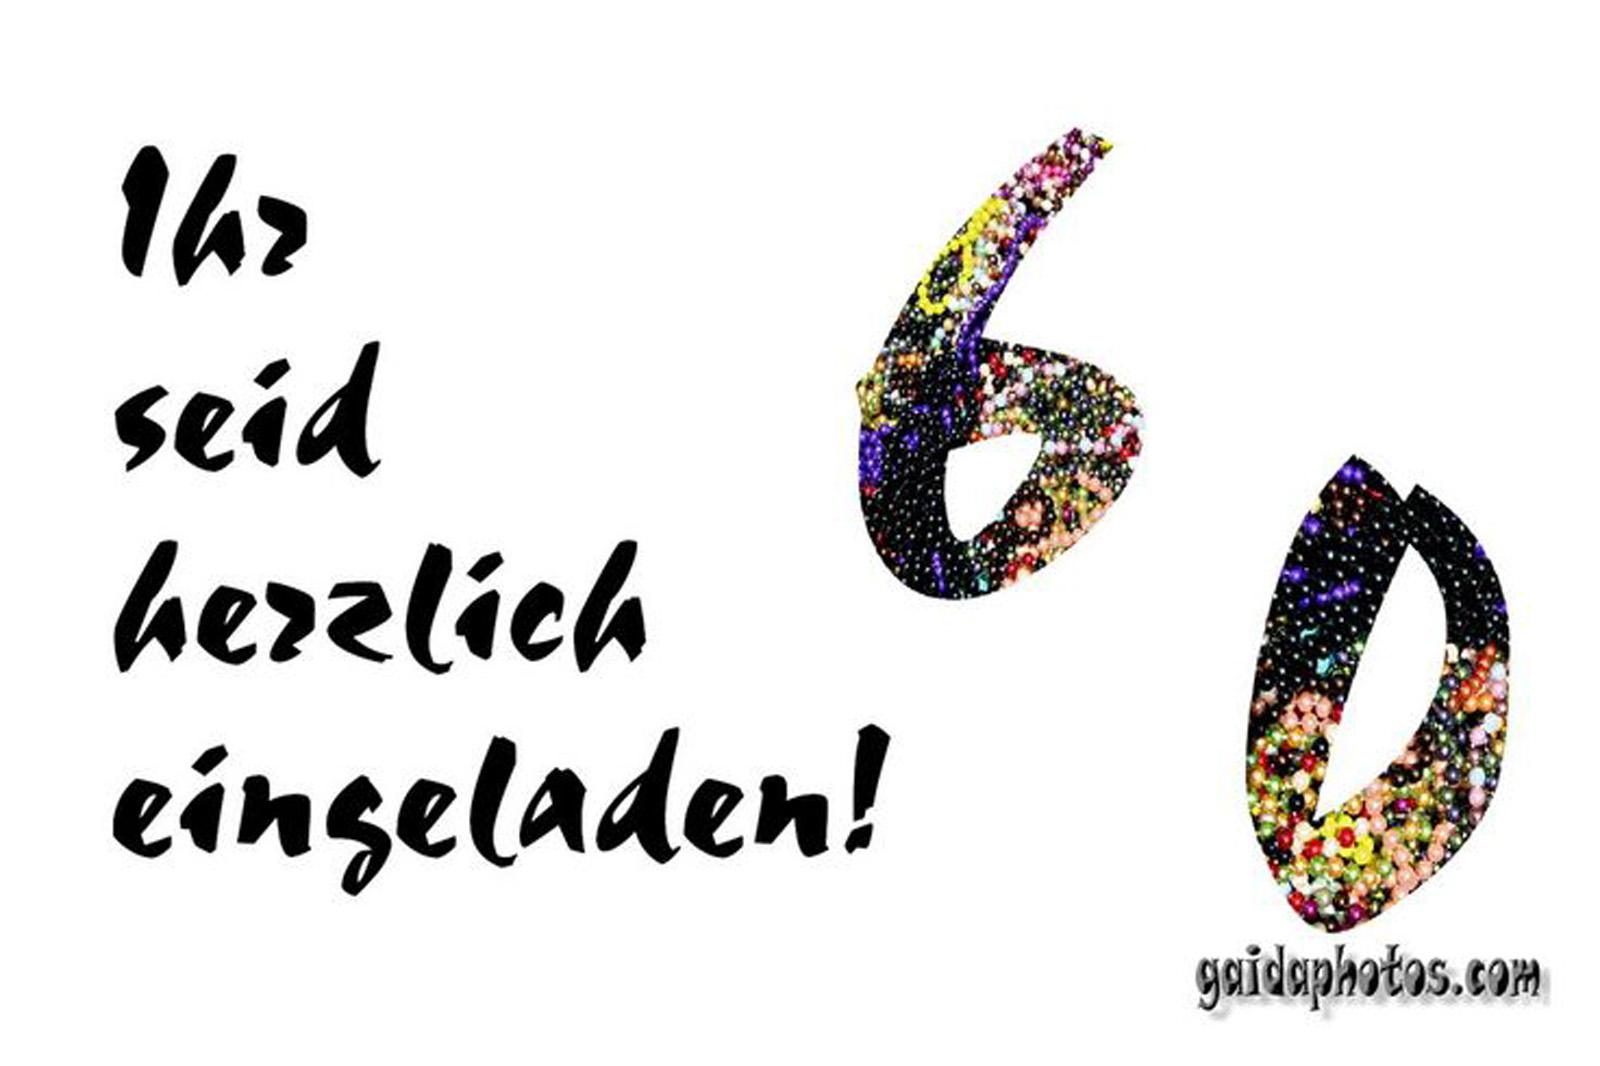 Clip art geburtstag einladung clip art library 60 Geburtstag Einladung Vorlagen | epagini.info clip art library